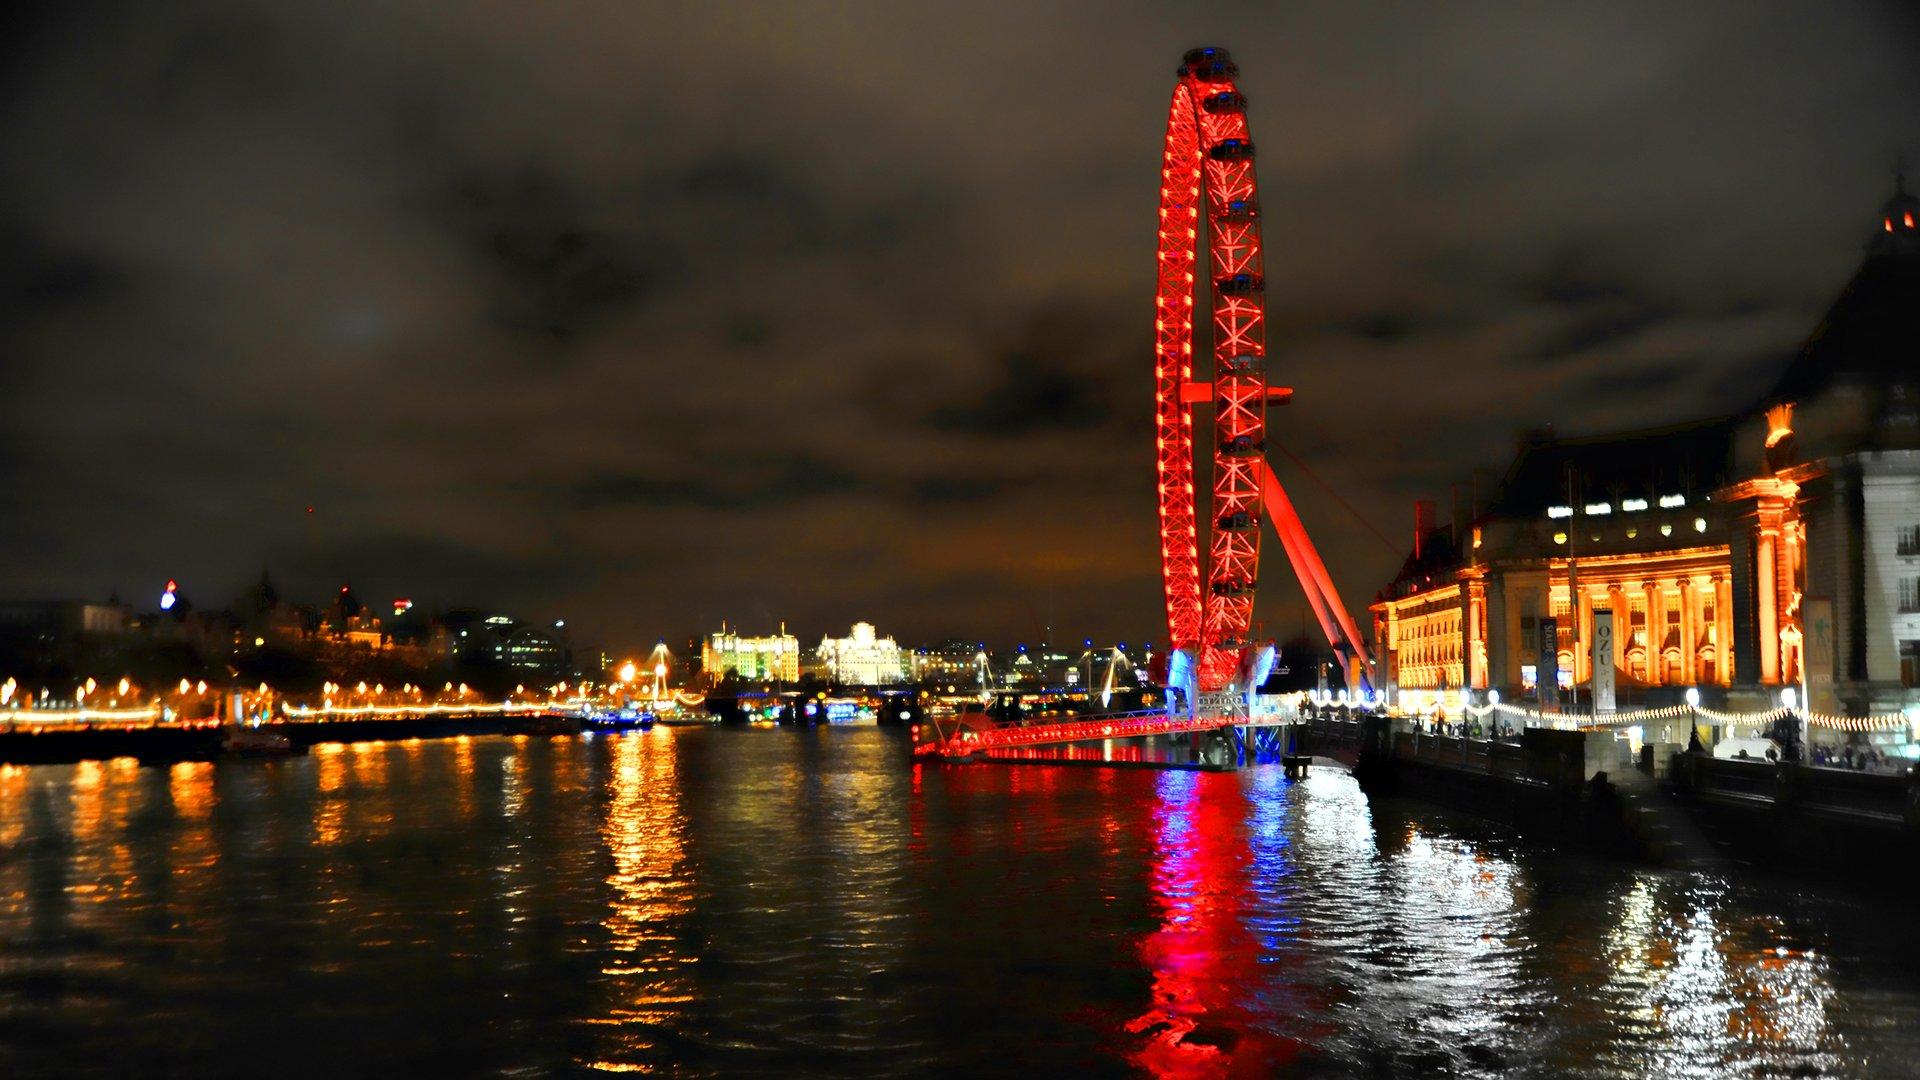 Hd wallpaper london - Giant London Eye Wallpaper Travel Hd Wallpapers